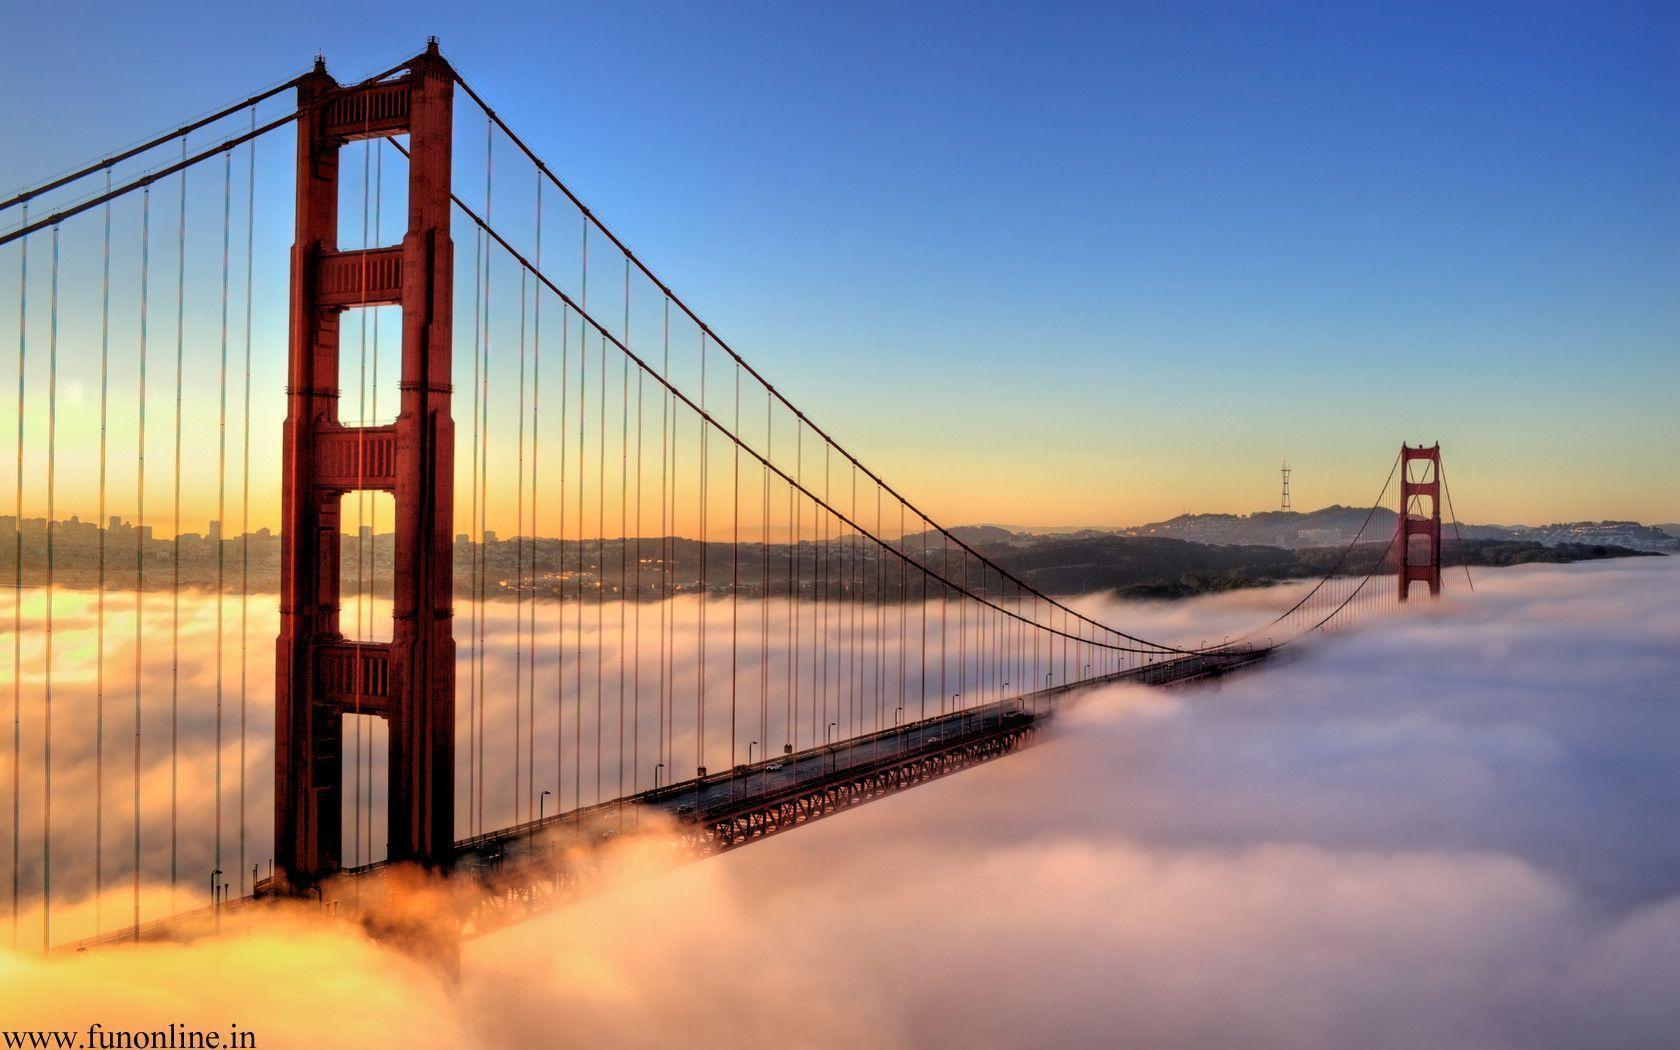 Golden Gate Bridge Wallpapers - Wallpaper Cave